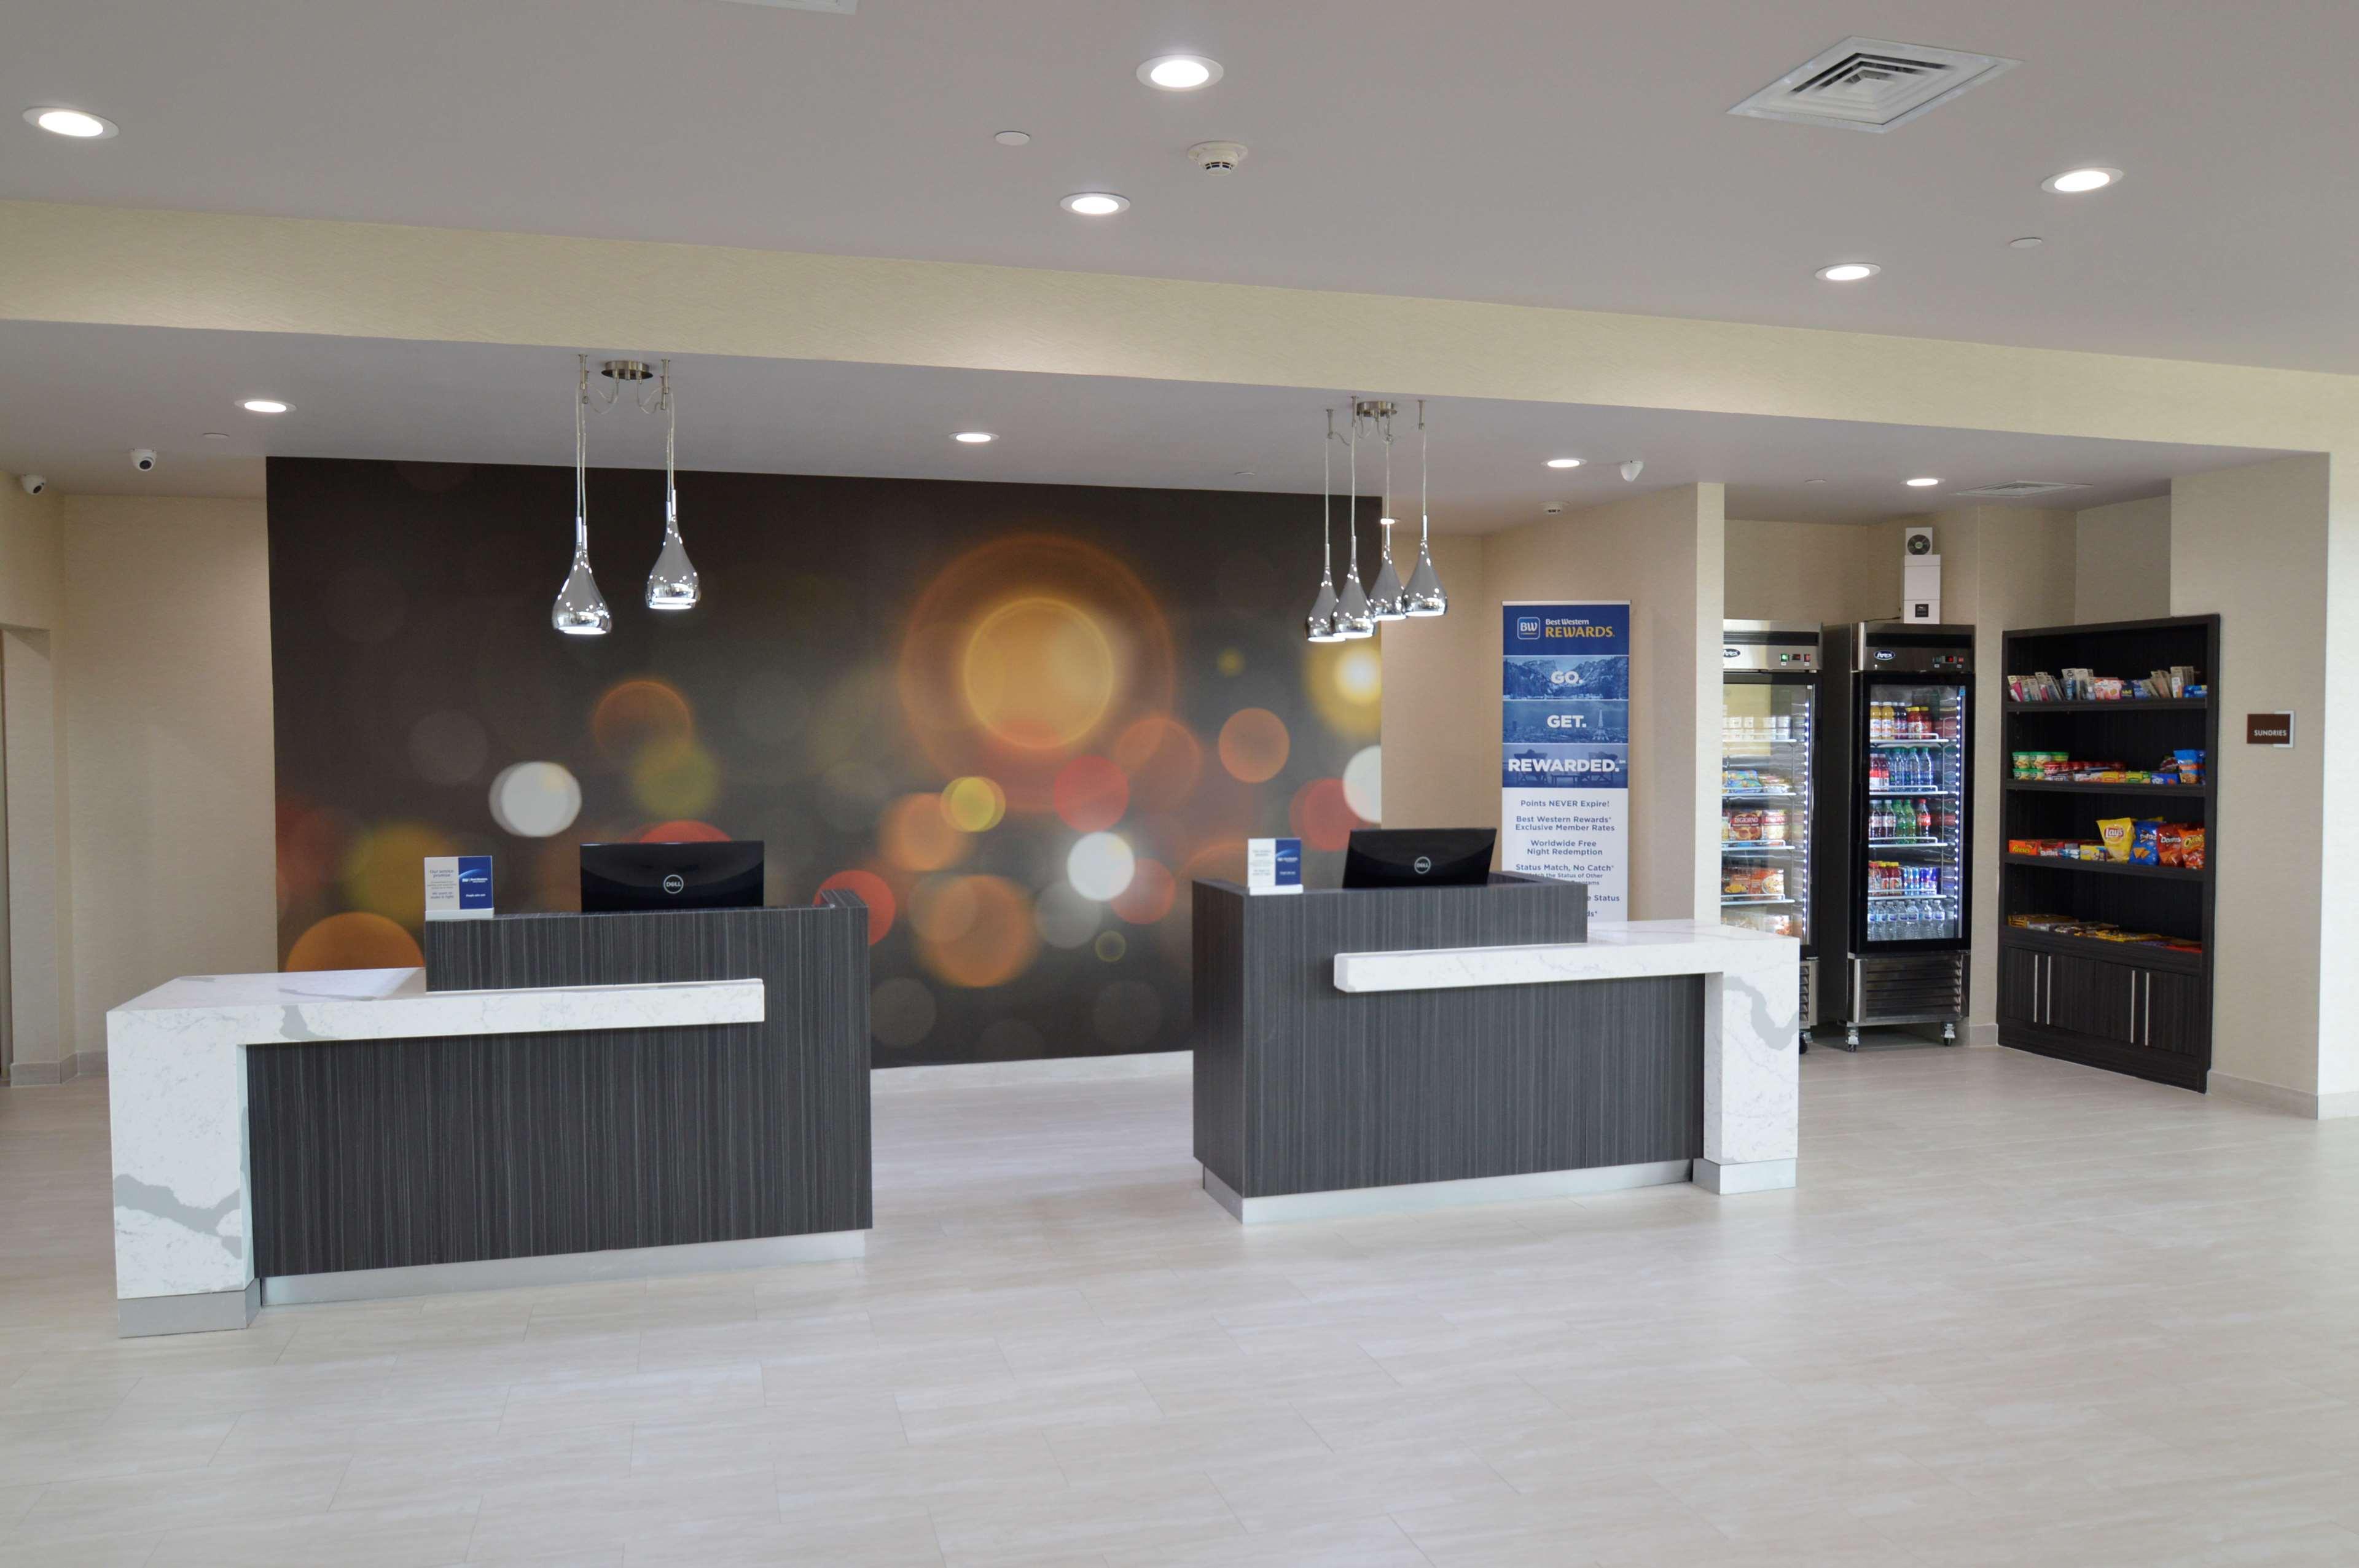 Executive Residency by Best Western Baytown image 3